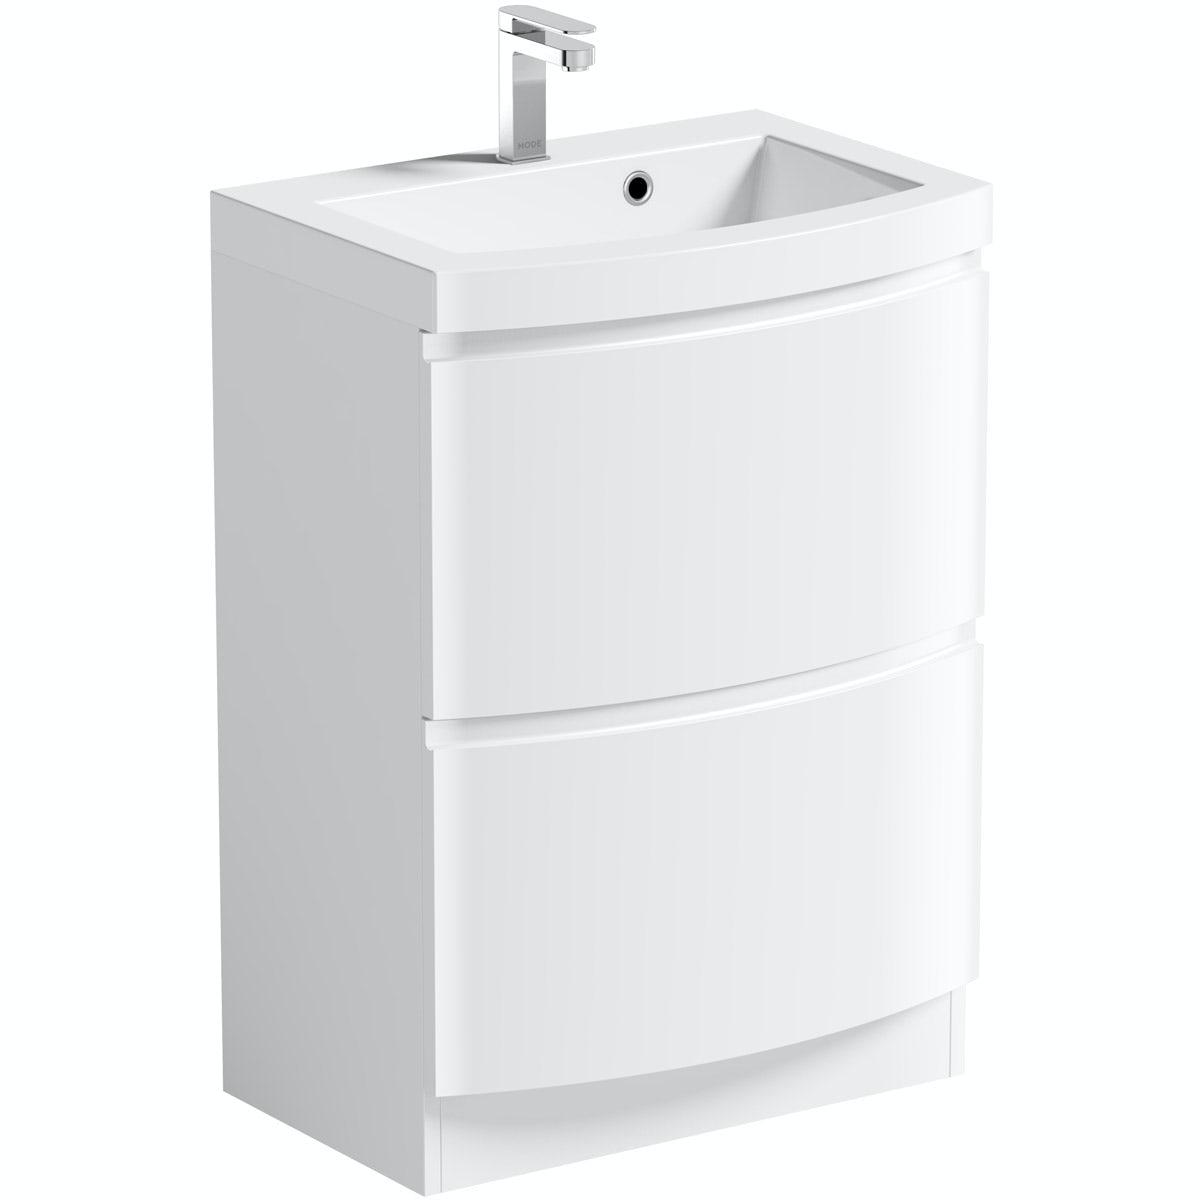 Mode Harrison snow vanity unit and basin 600mm